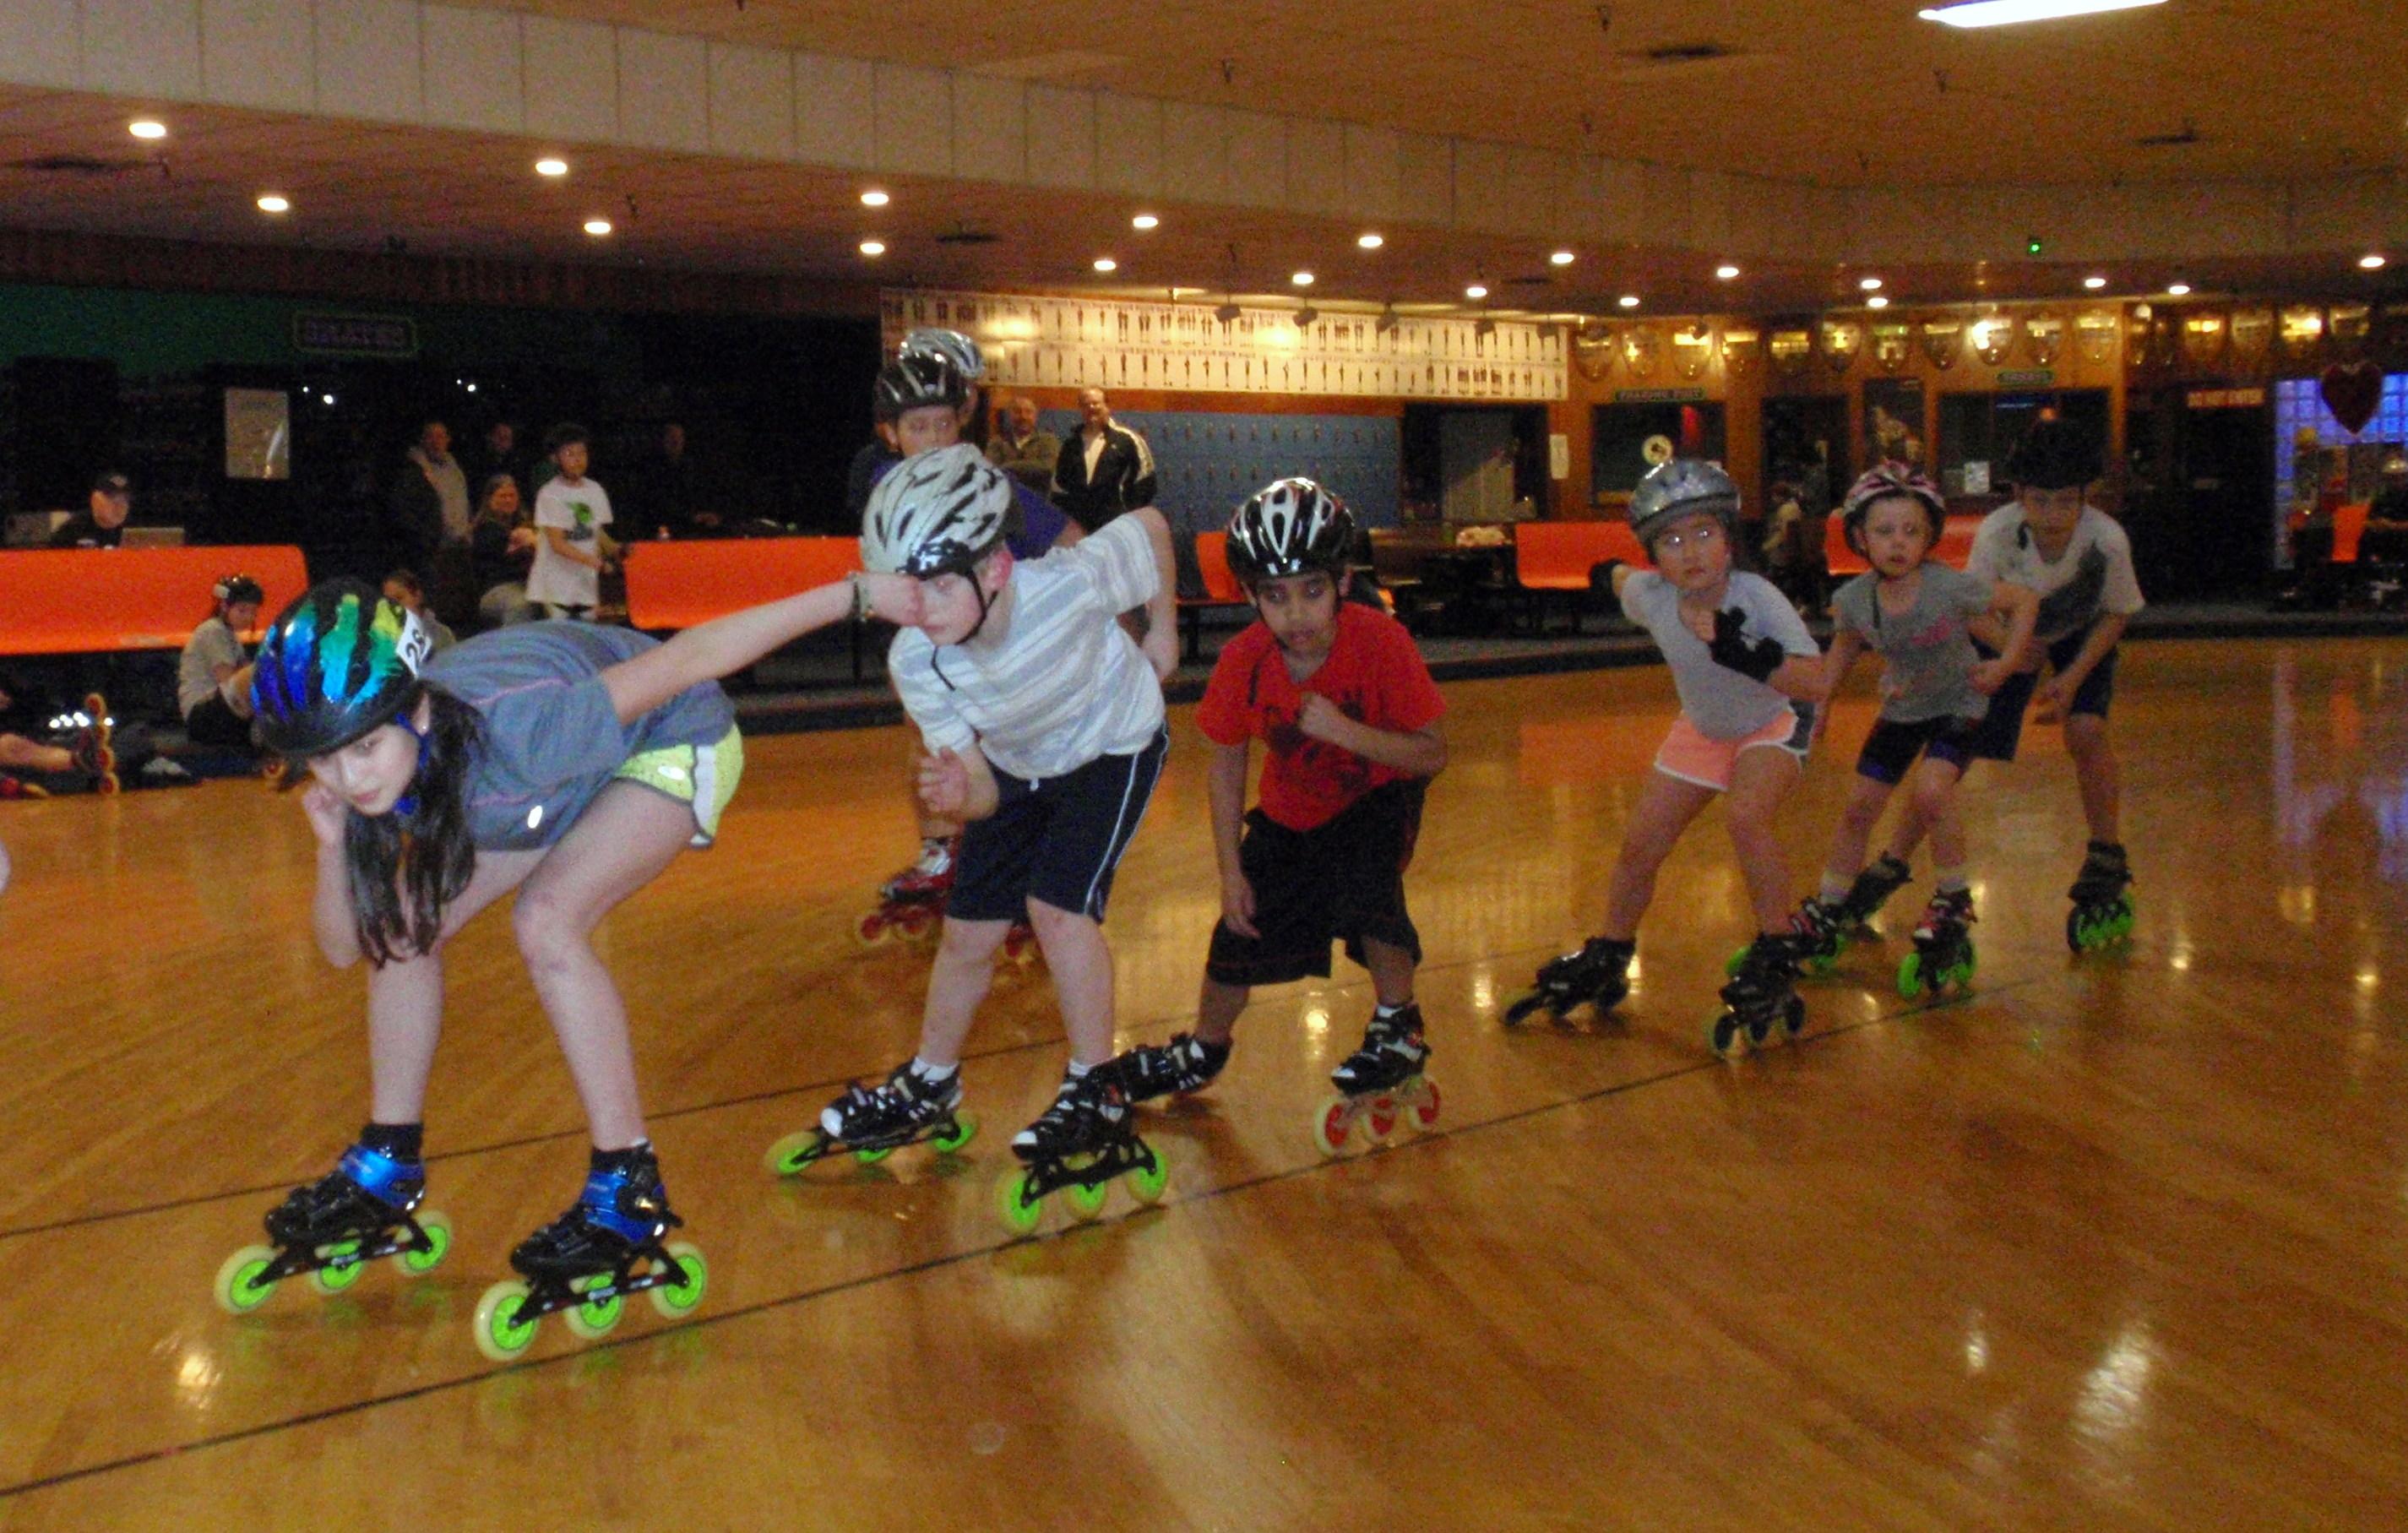 the roller skating rink